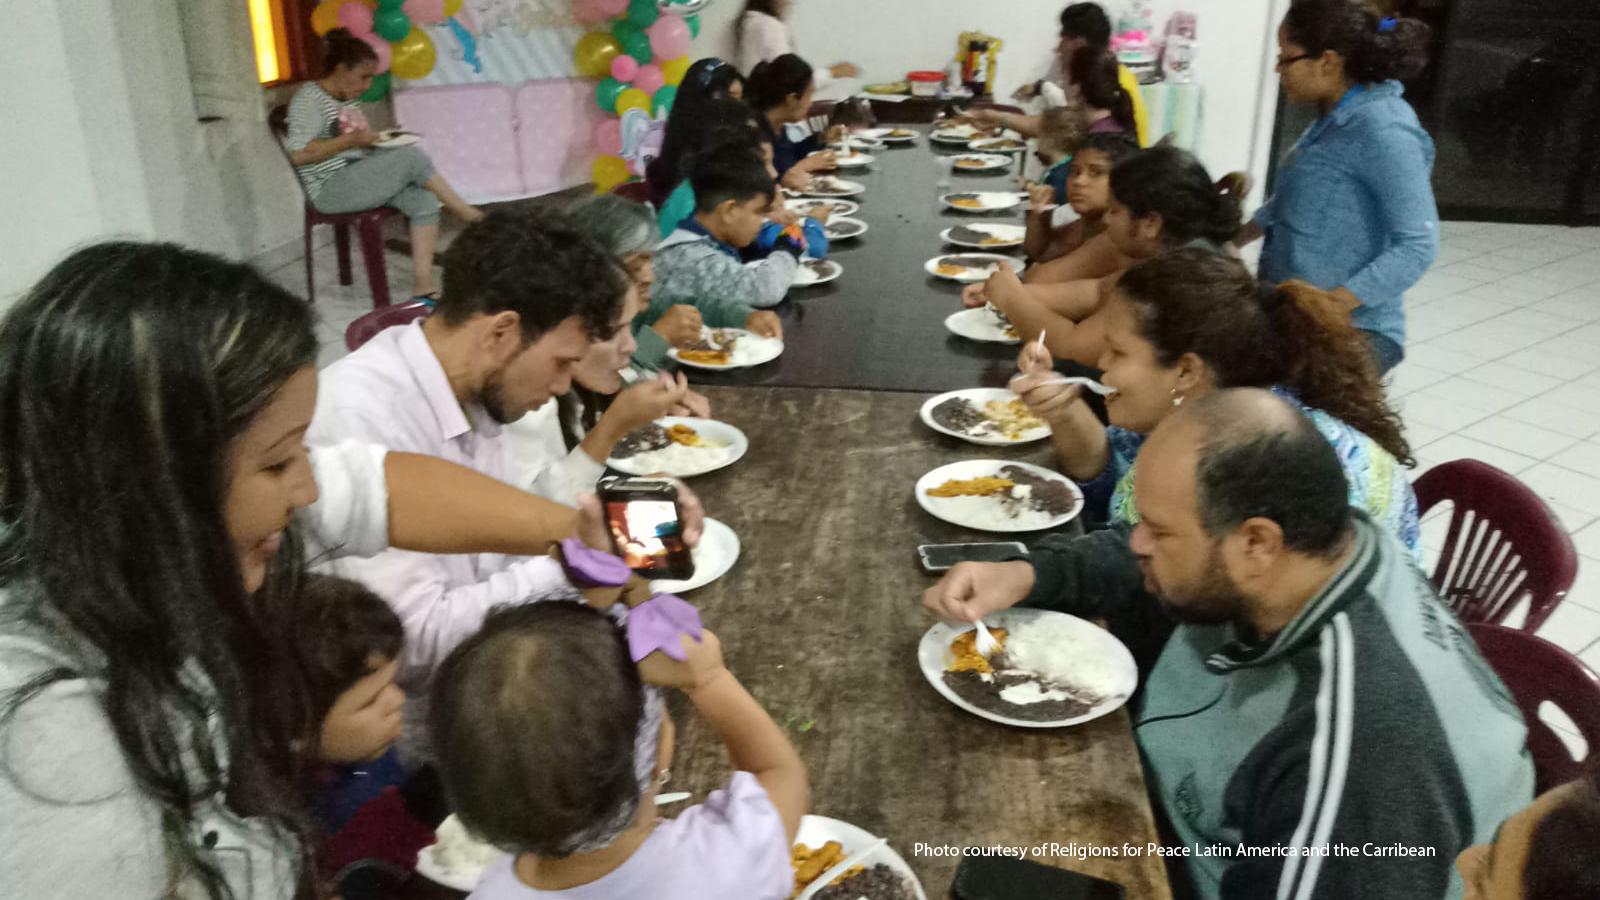 Venezuelans sharing a community meal.